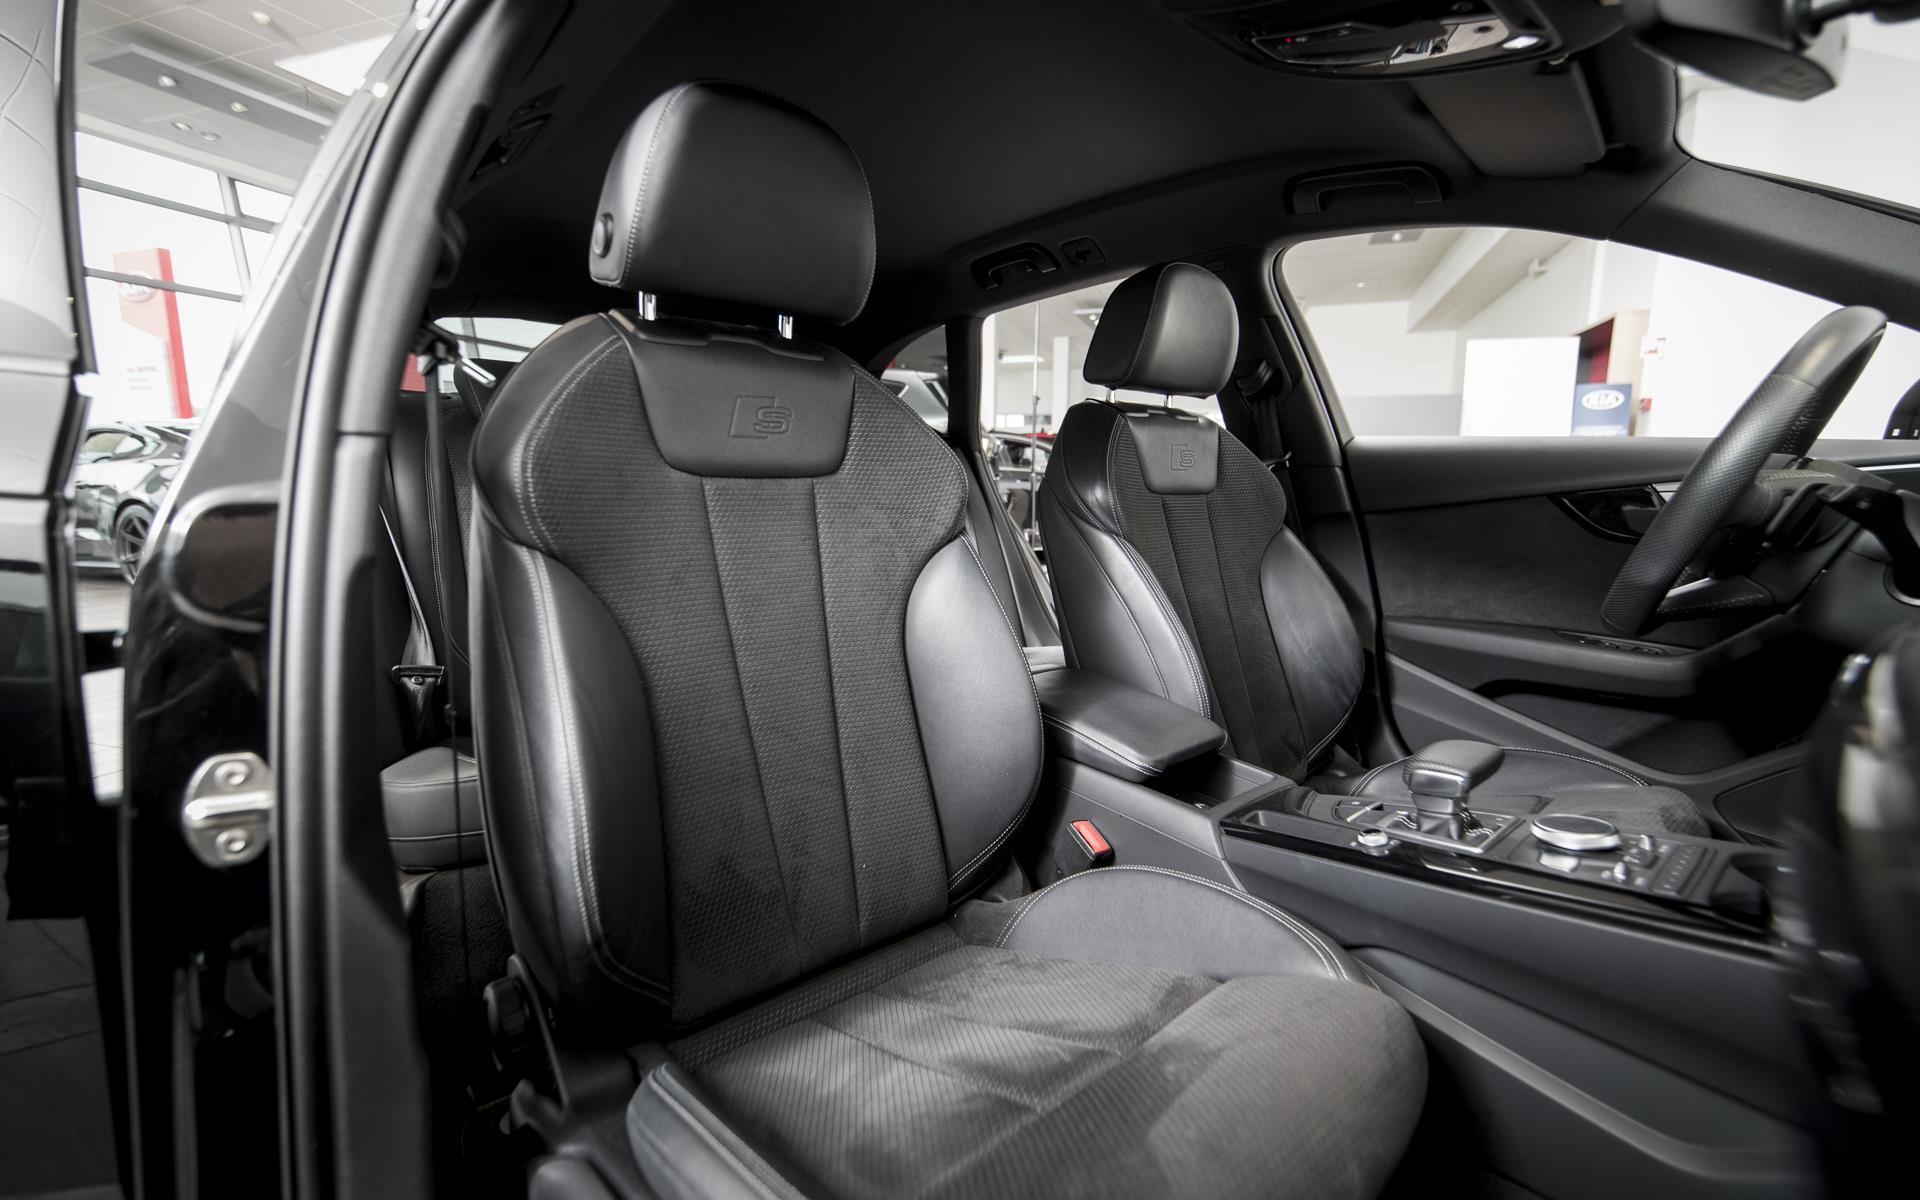 Avant 2,0 TDI S-Line Black Edition TipTronic 190HK Stc  image11